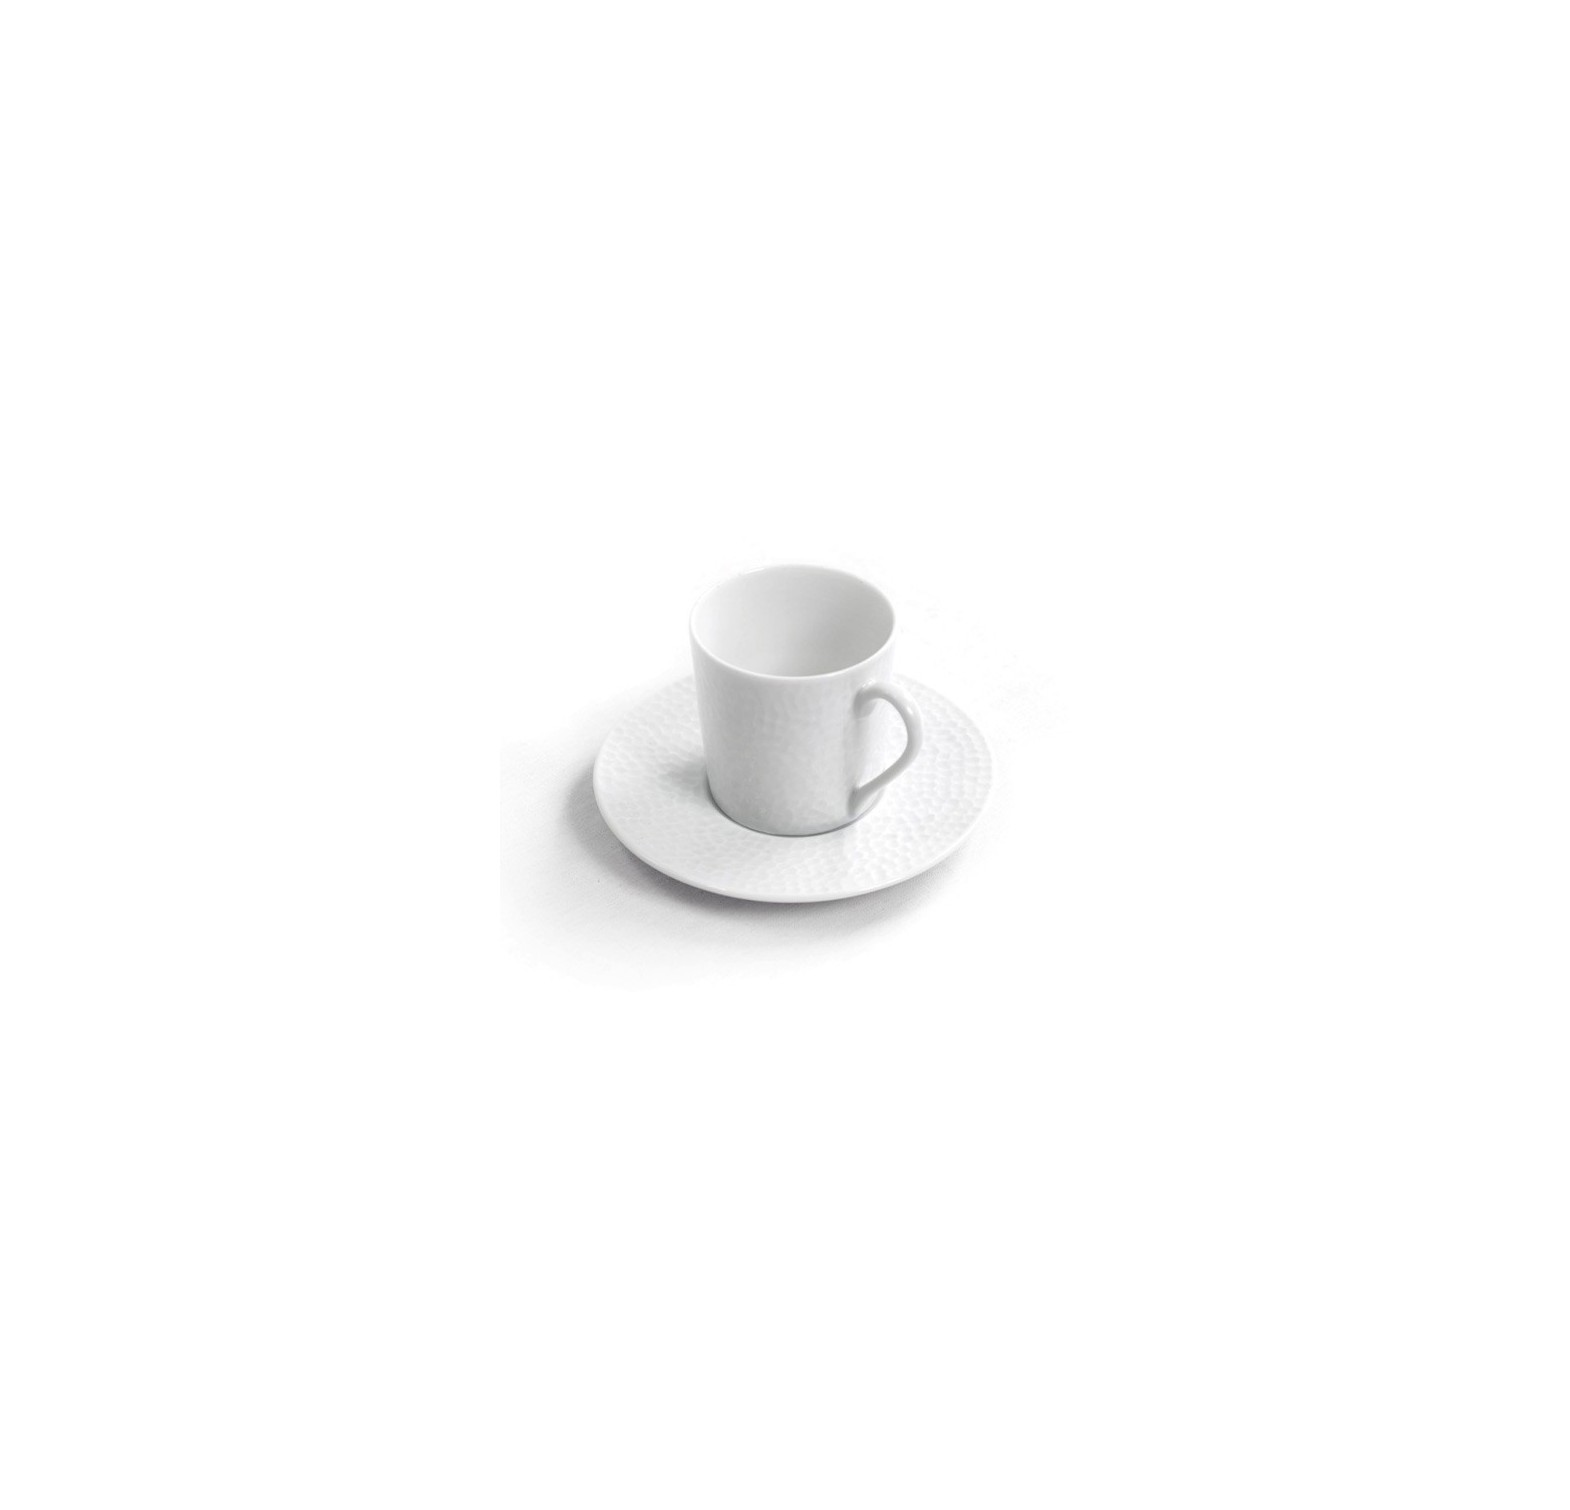 Thé & café